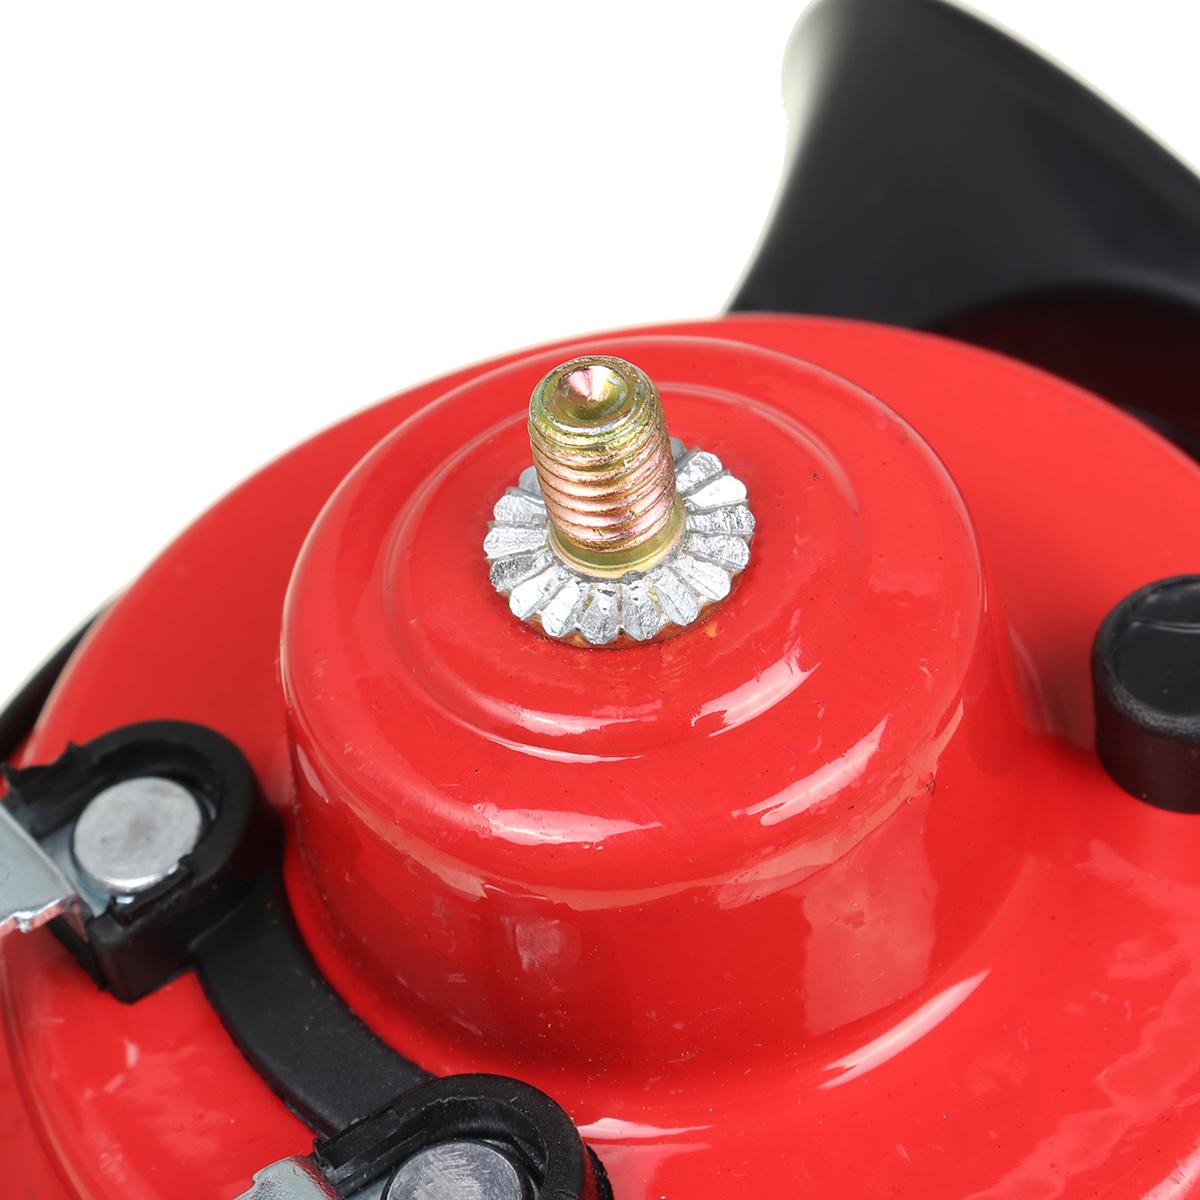 1 PCS 12V 300DB Universal Electric Snail Horn Super Loud Air Horn Waterproof Car Horns